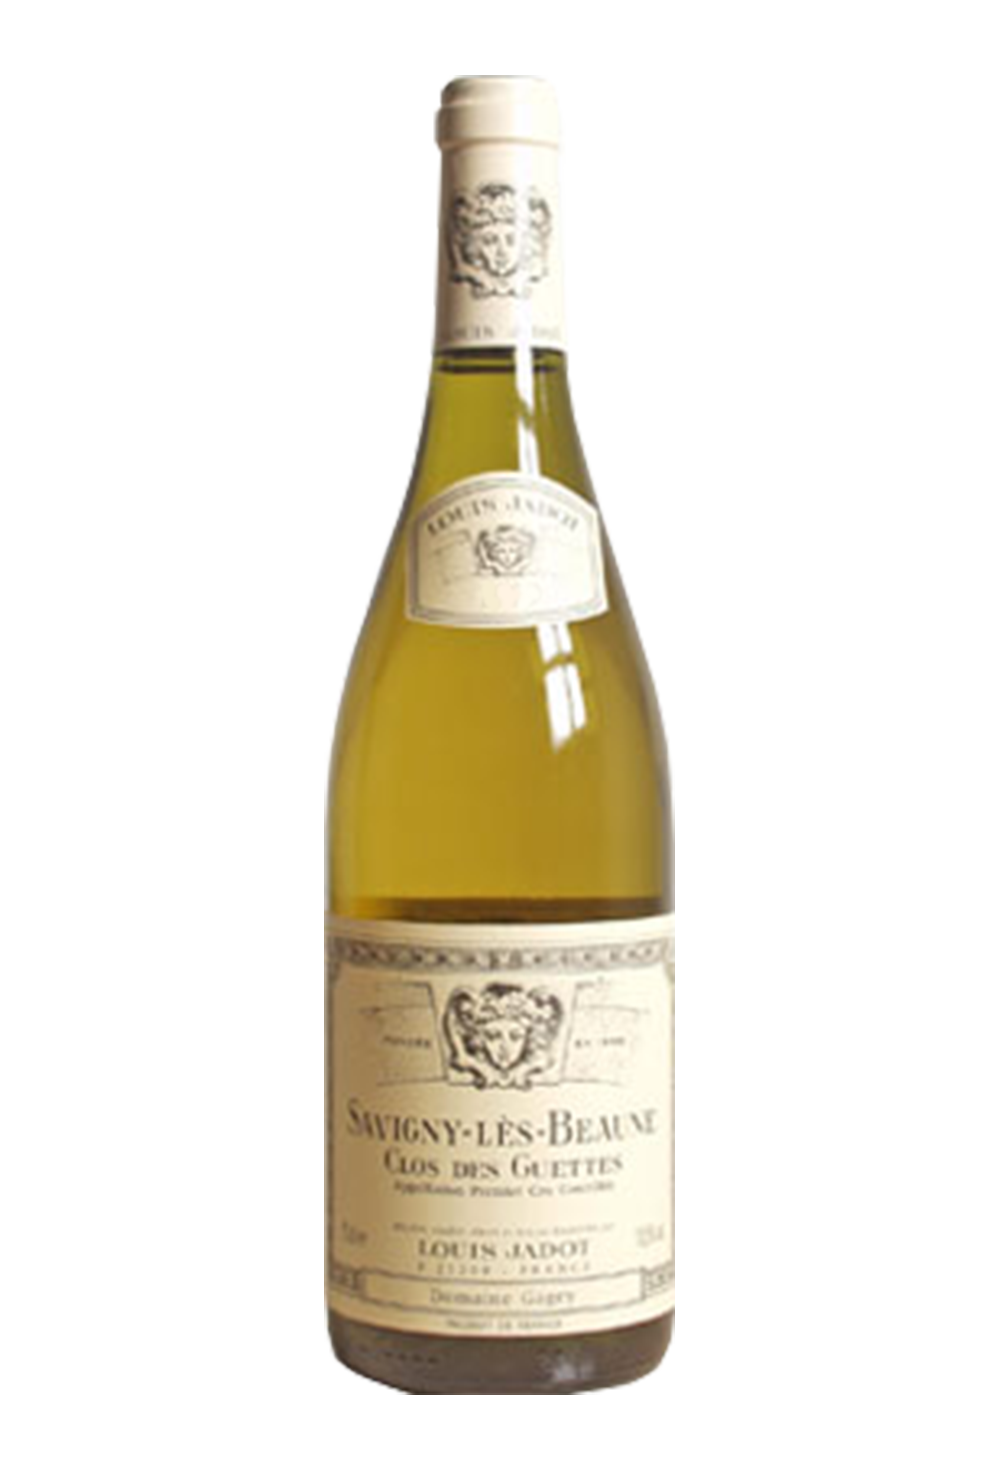 Savigny Les Beaune 1er Cru Clos Des Guettes Blanc Les